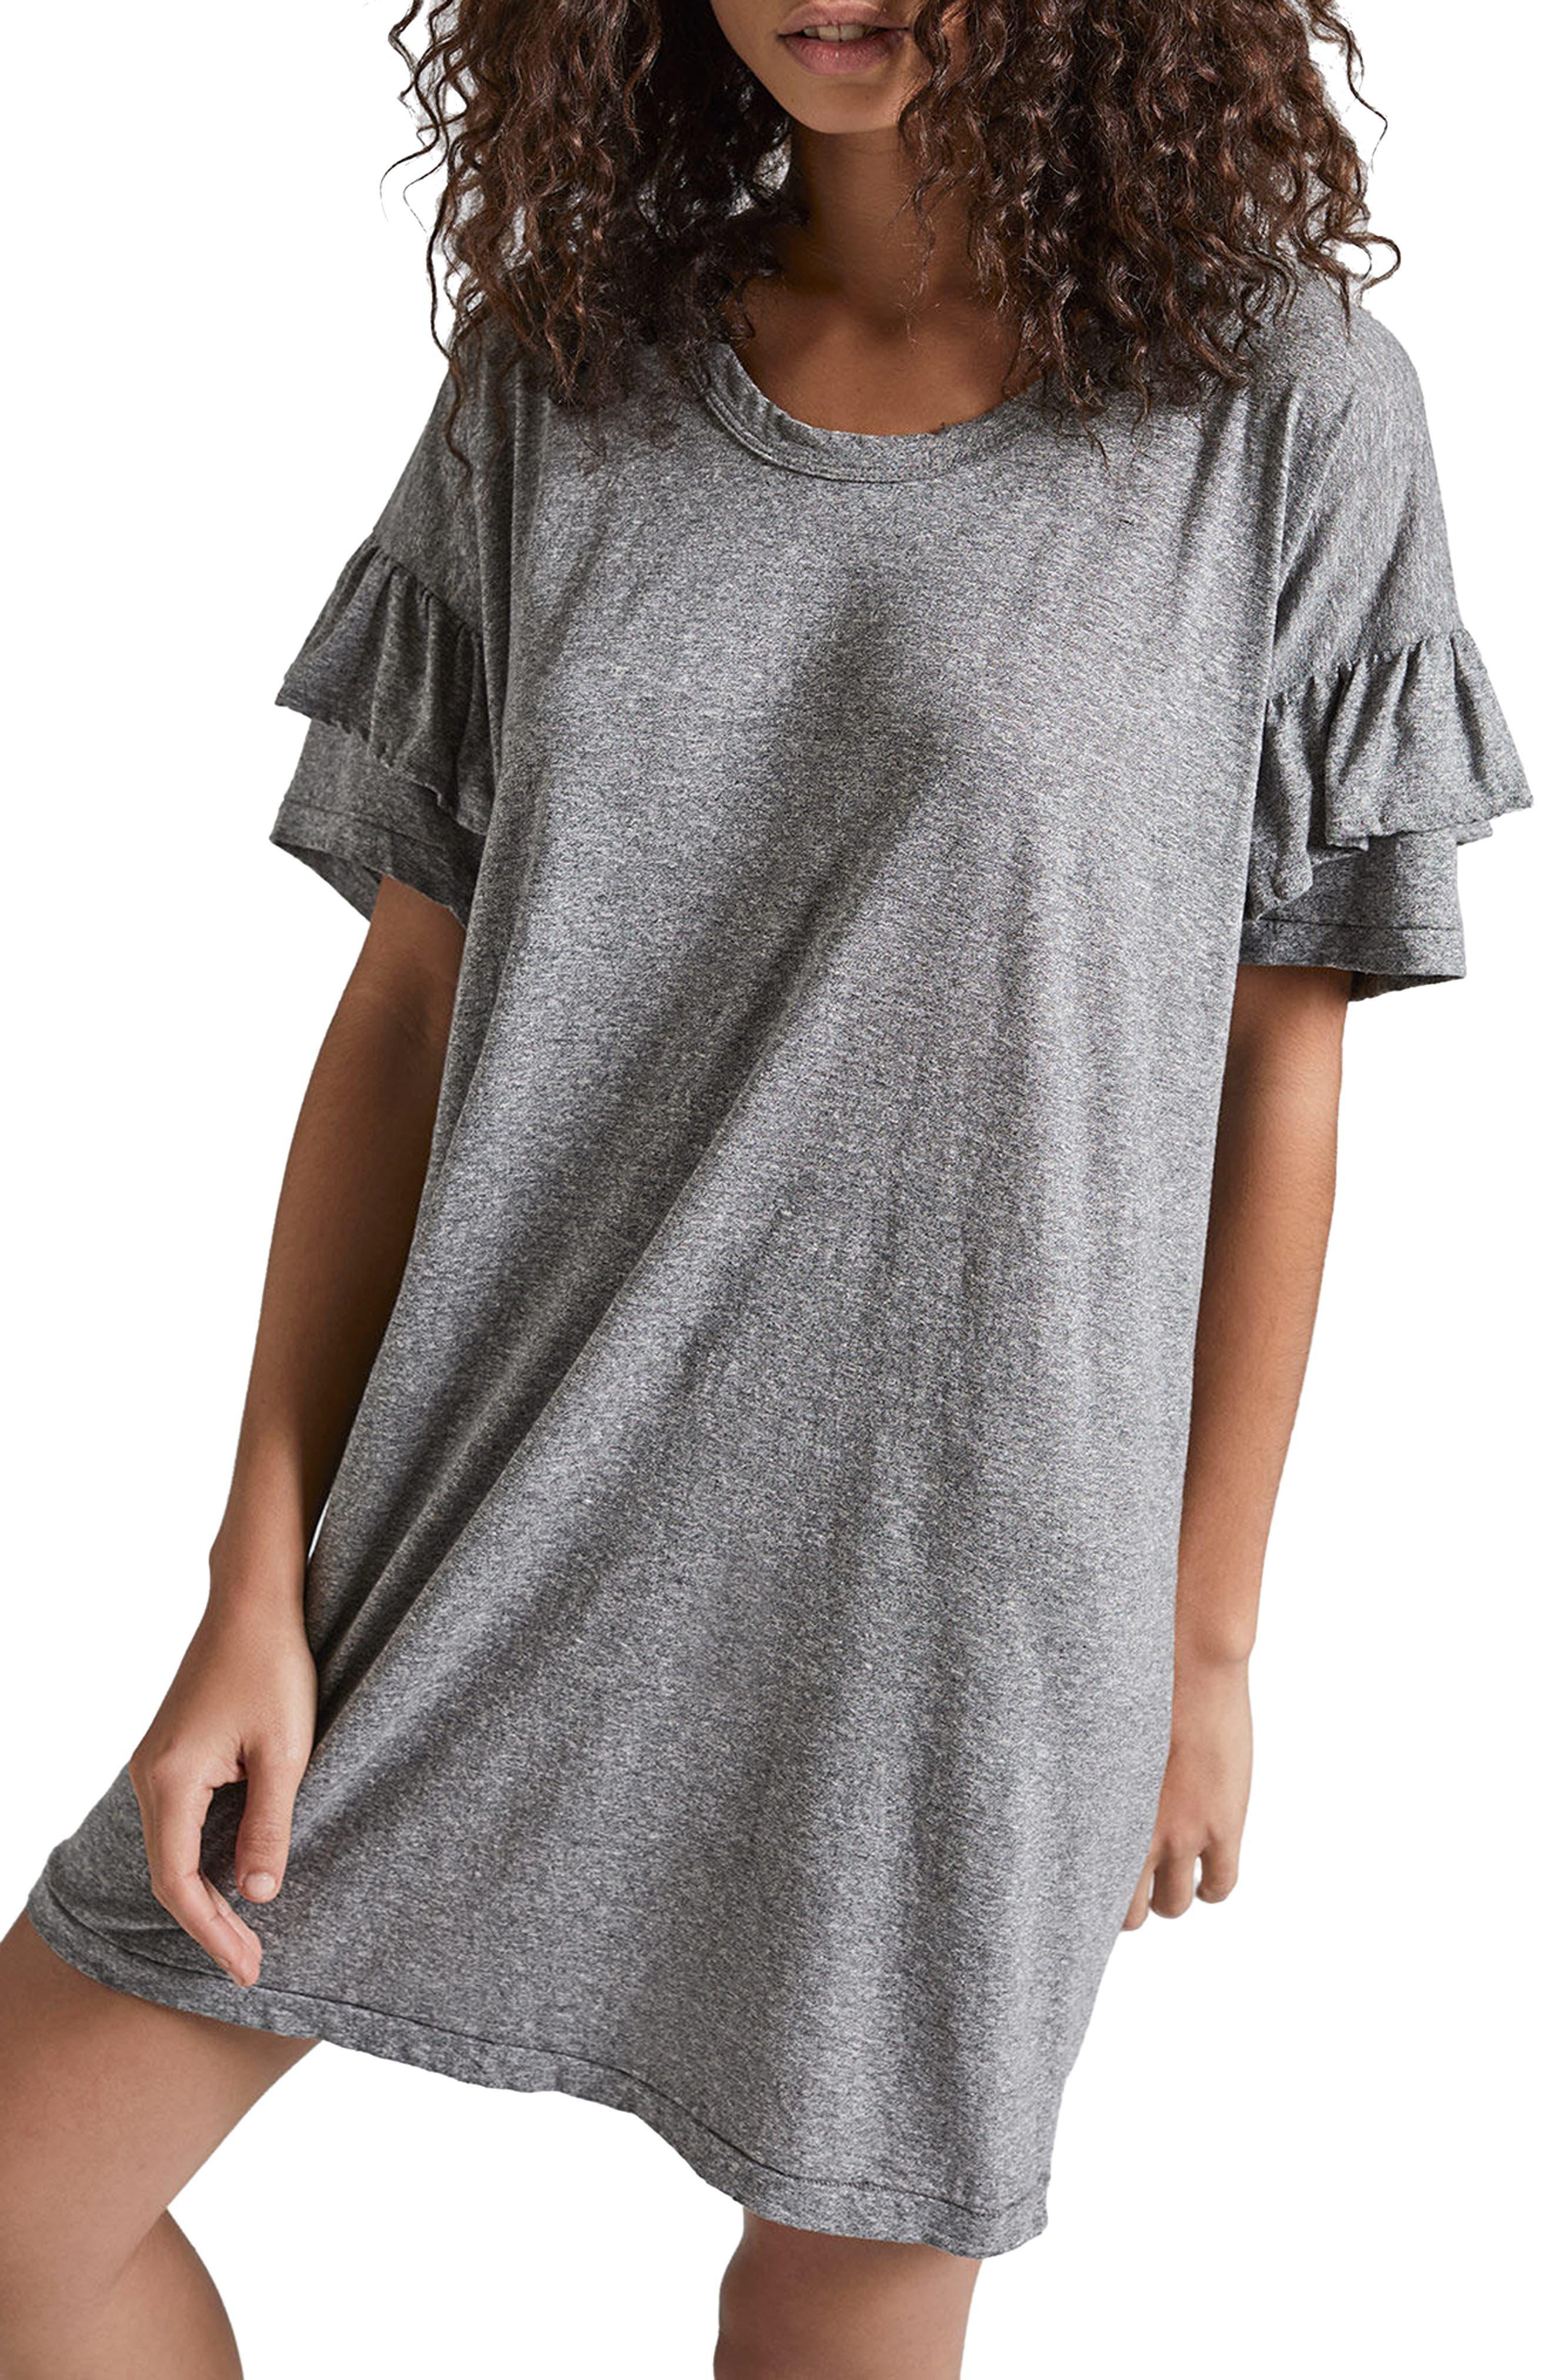 Ruffle Roadie T-Shirt Dress,                         Main,                         color, Heather Grey